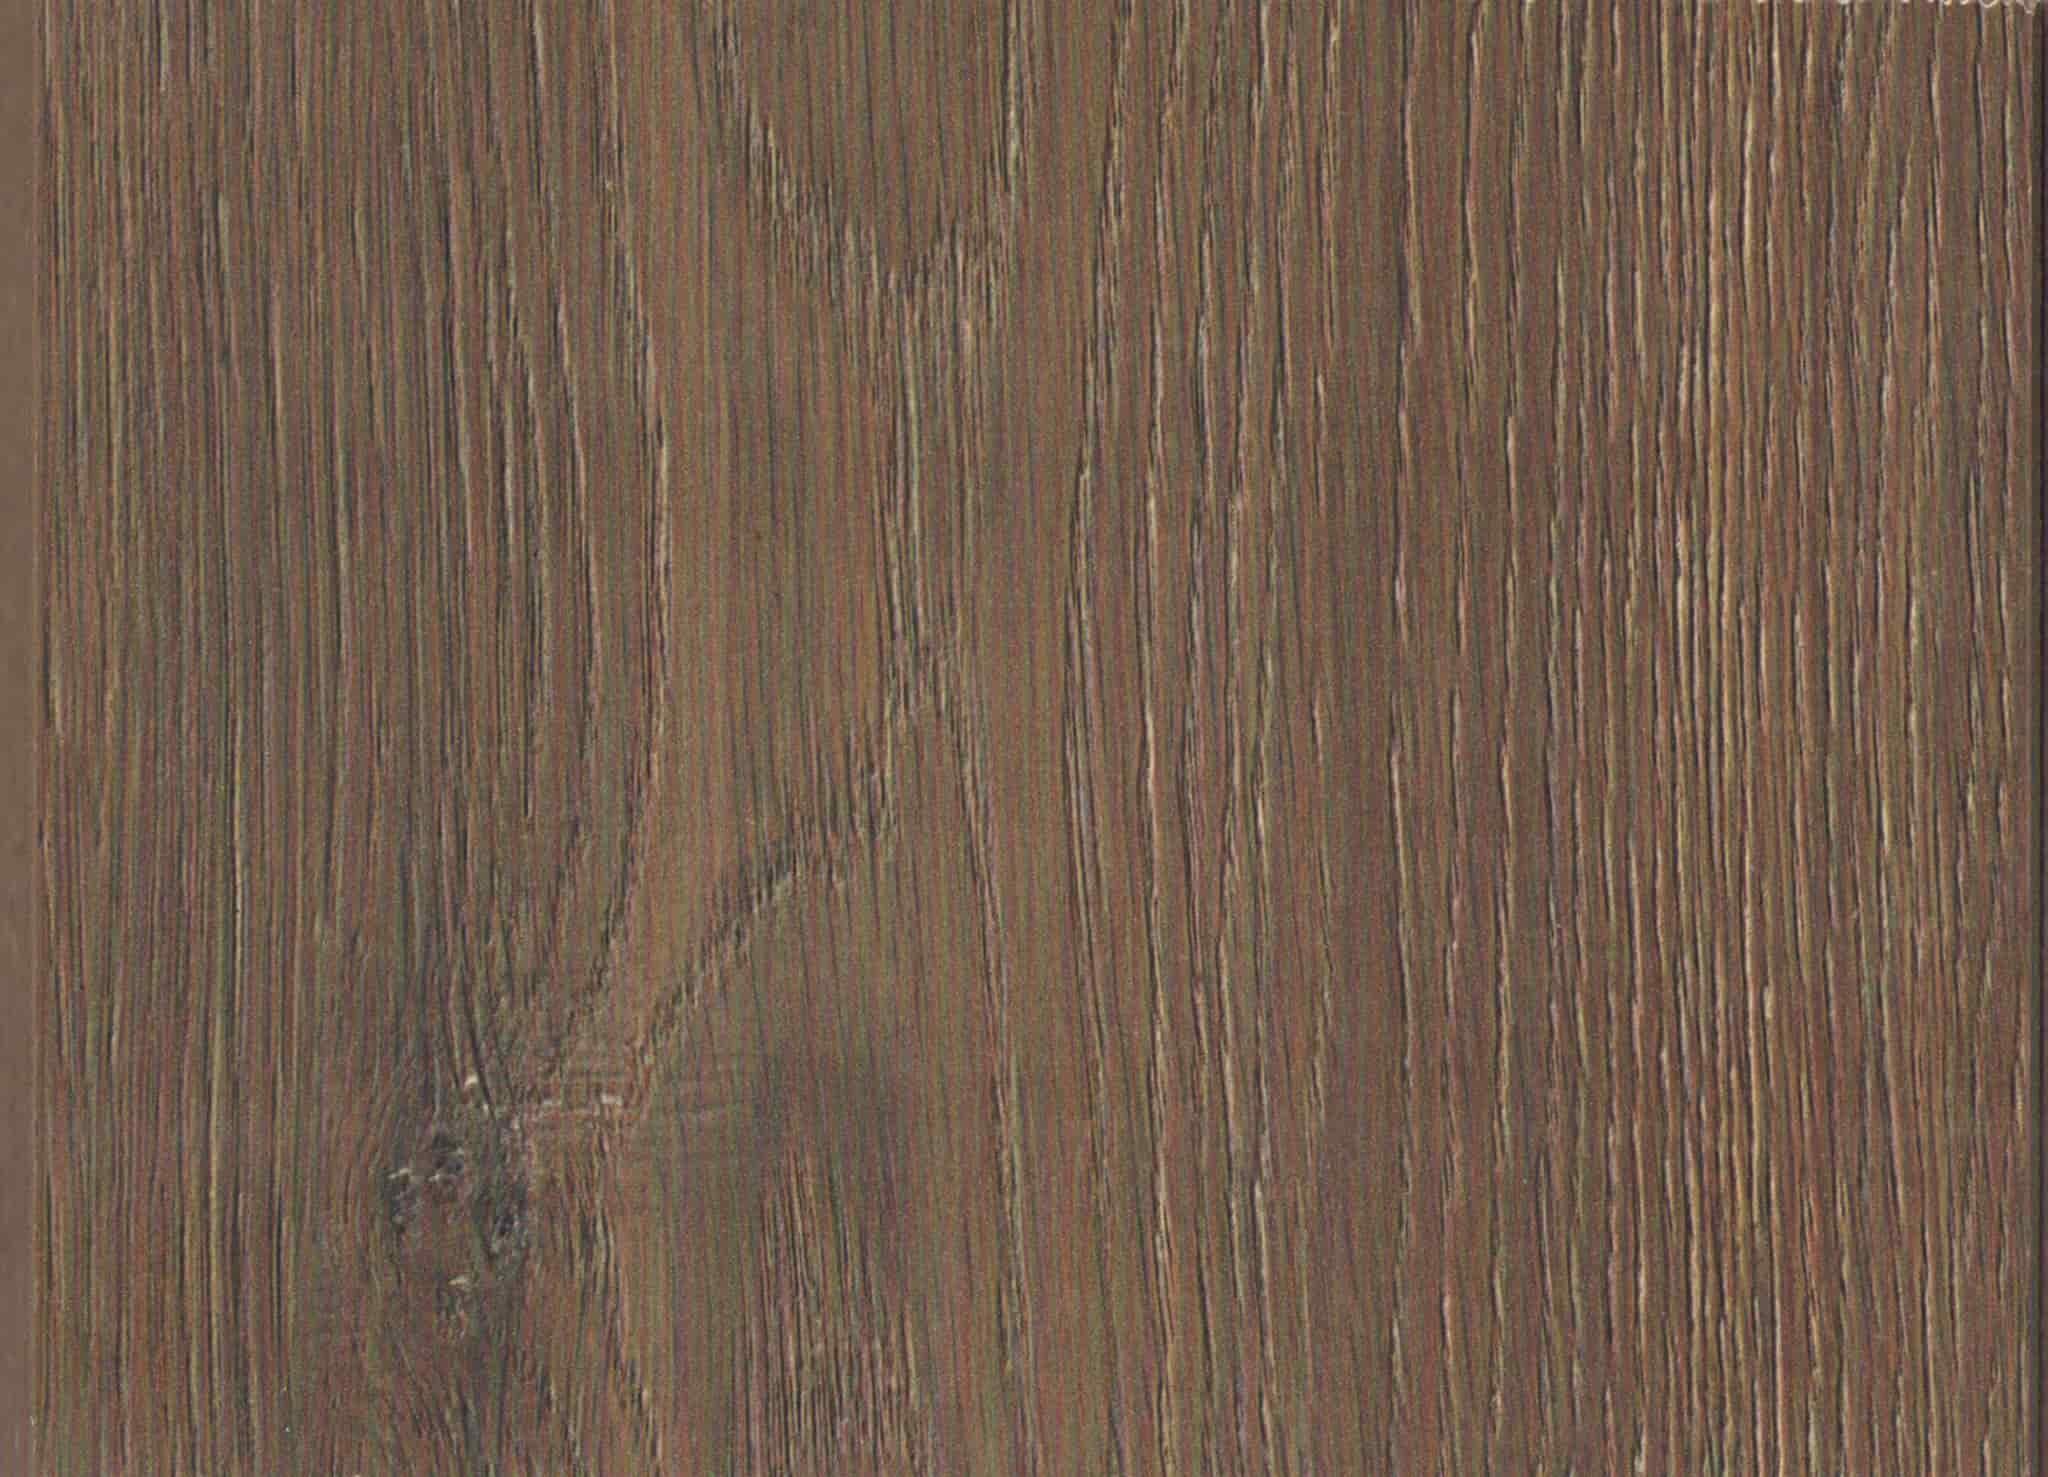 Surfaces India Flooring Pvt Ltd Andheri West Wall Paper Dealers In Mumbai Justdial